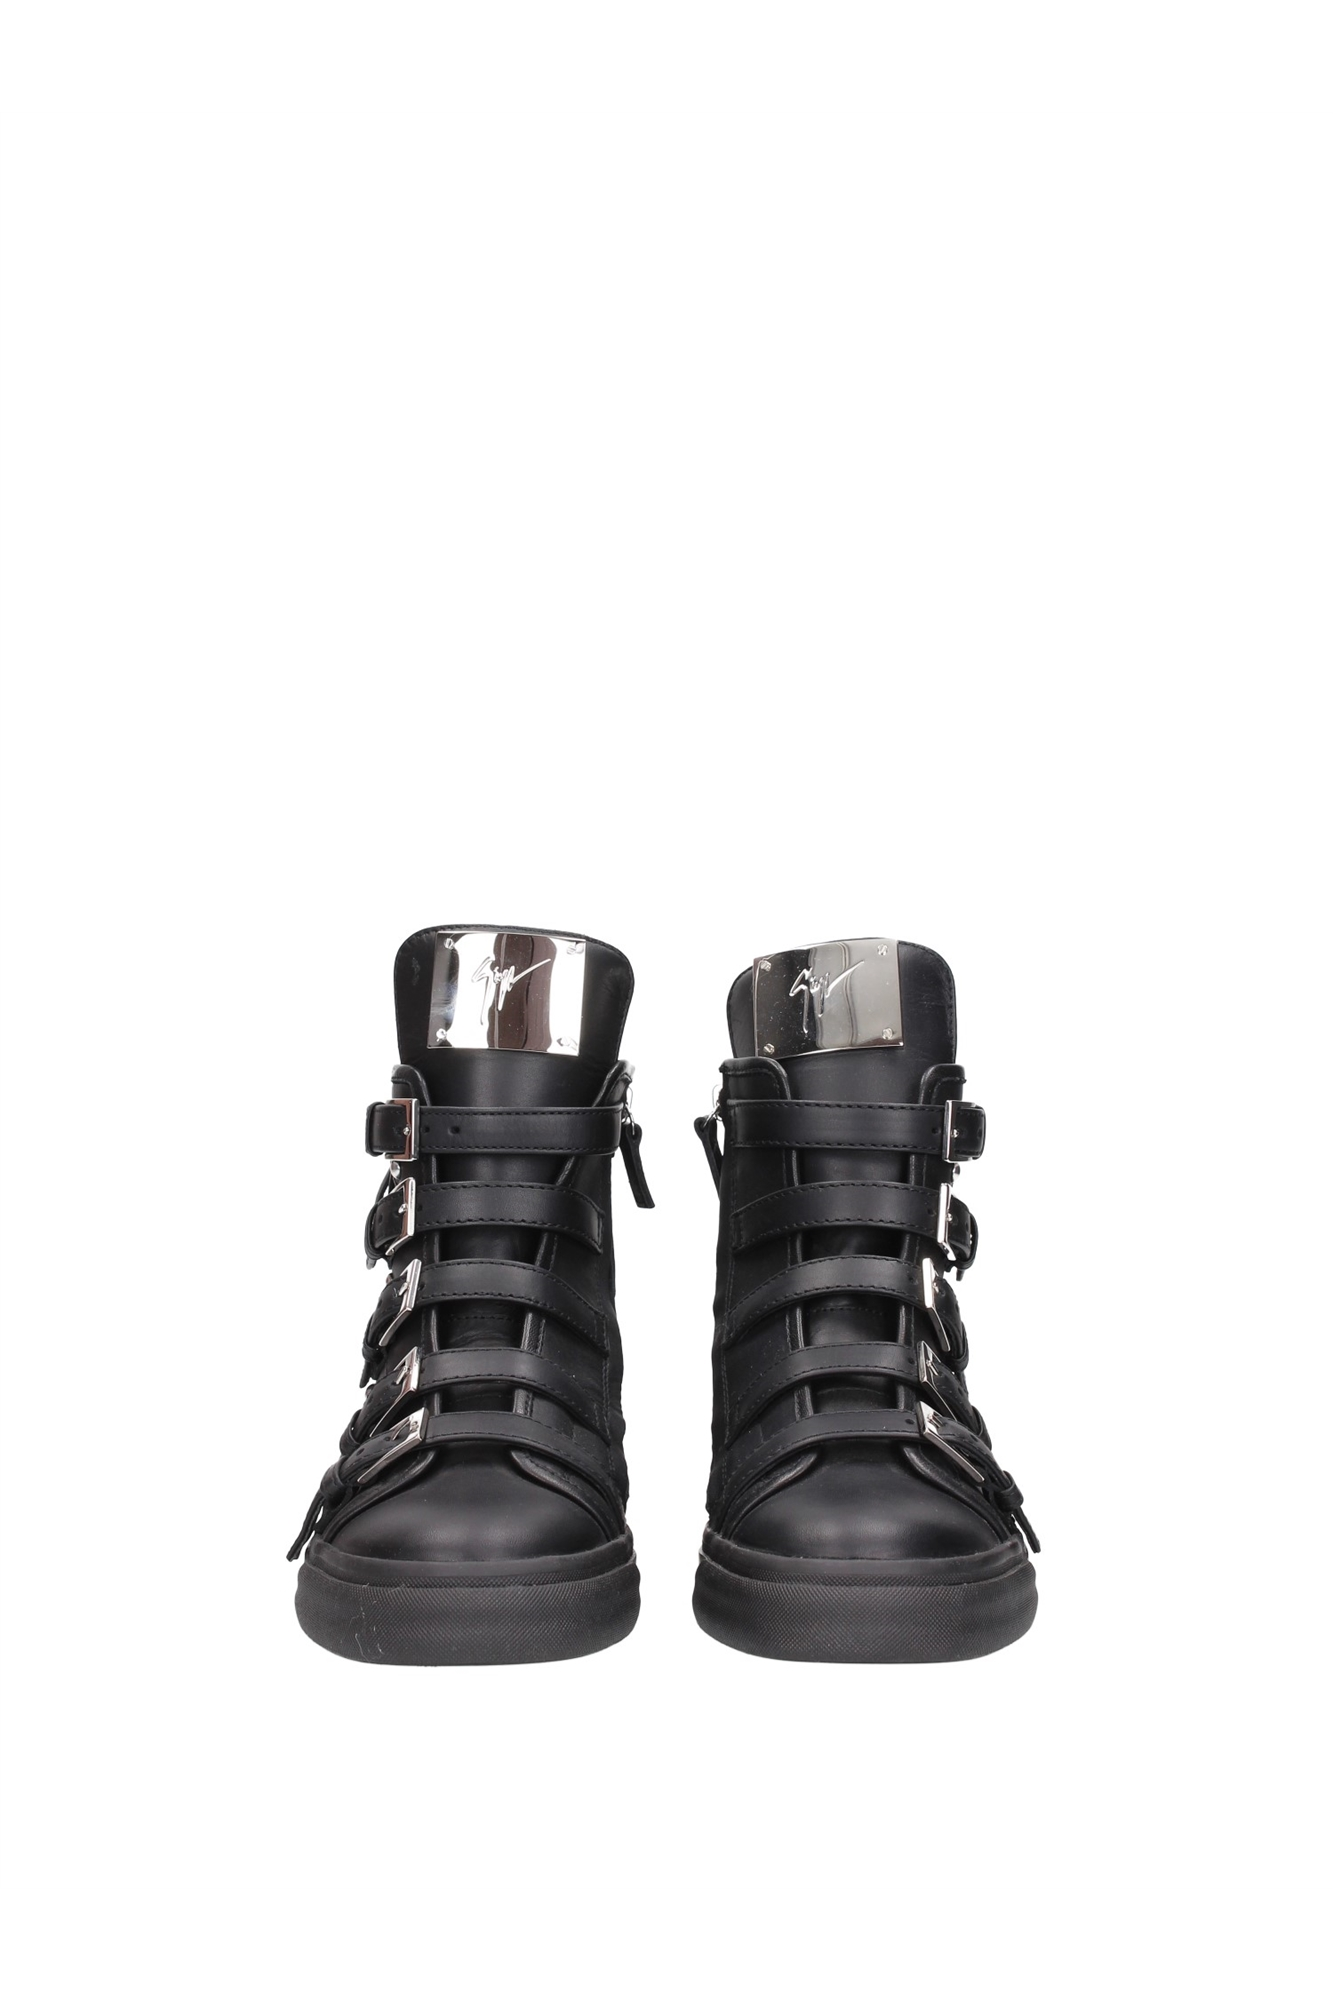 sneakers giuseppe zanotti damen leder schwarz rw4107londonnero ebay. Black Bedroom Furniture Sets. Home Design Ideas